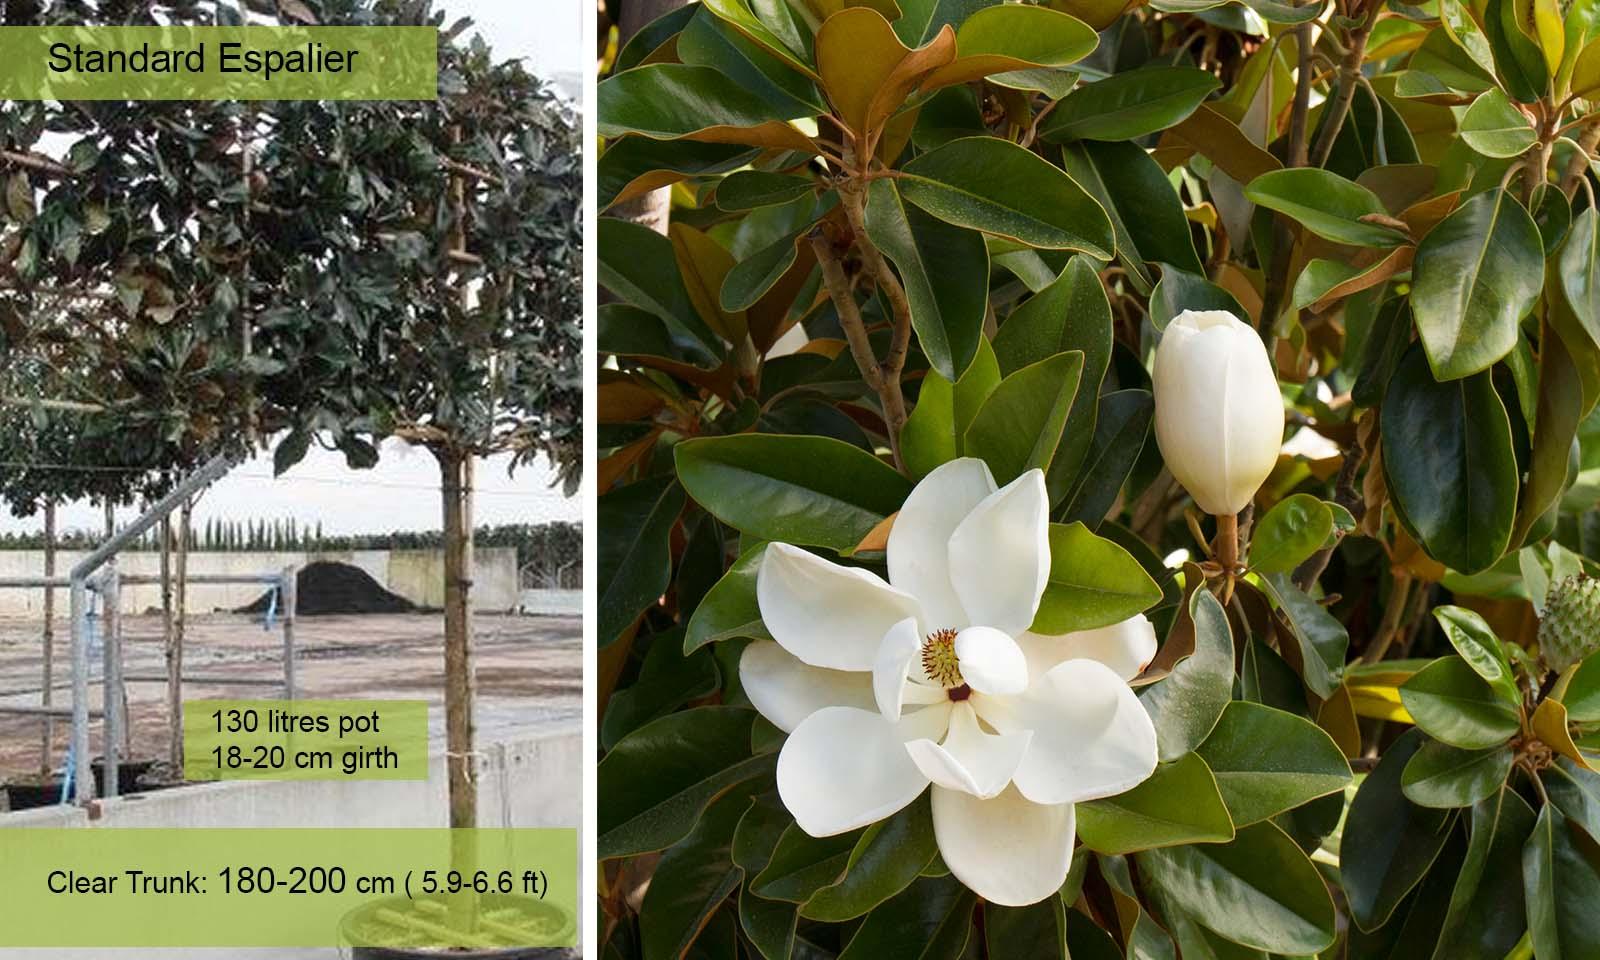 Magnolia Grandiflora - Standard Espalier